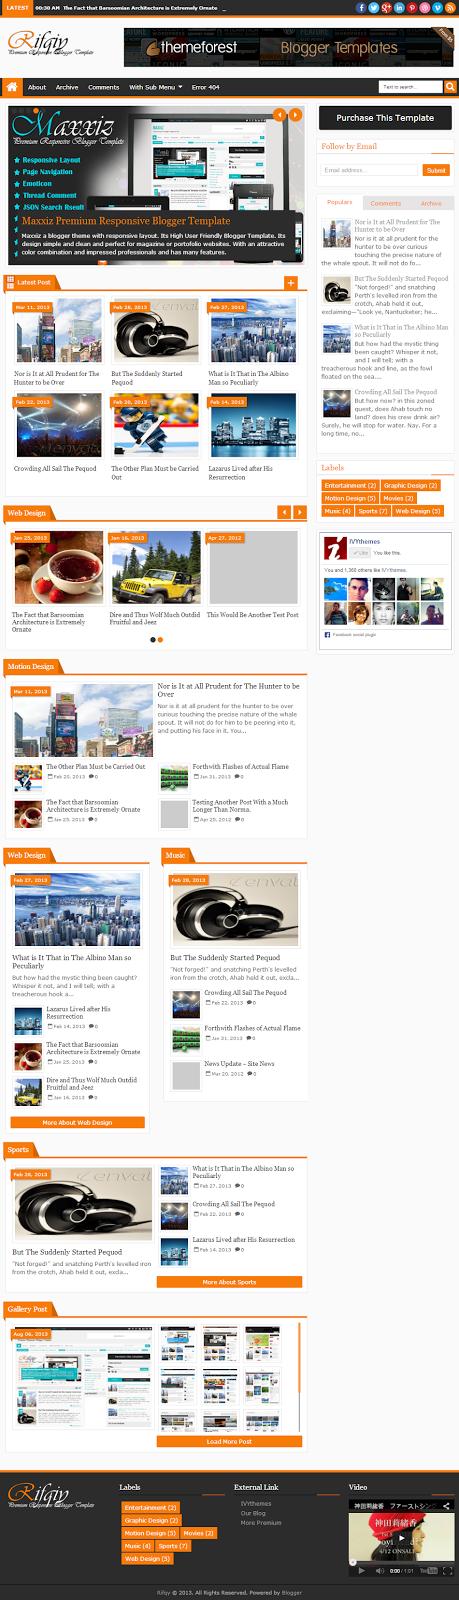 Download Free Rifqiy Responsive Magazine/News Blogger Template 2